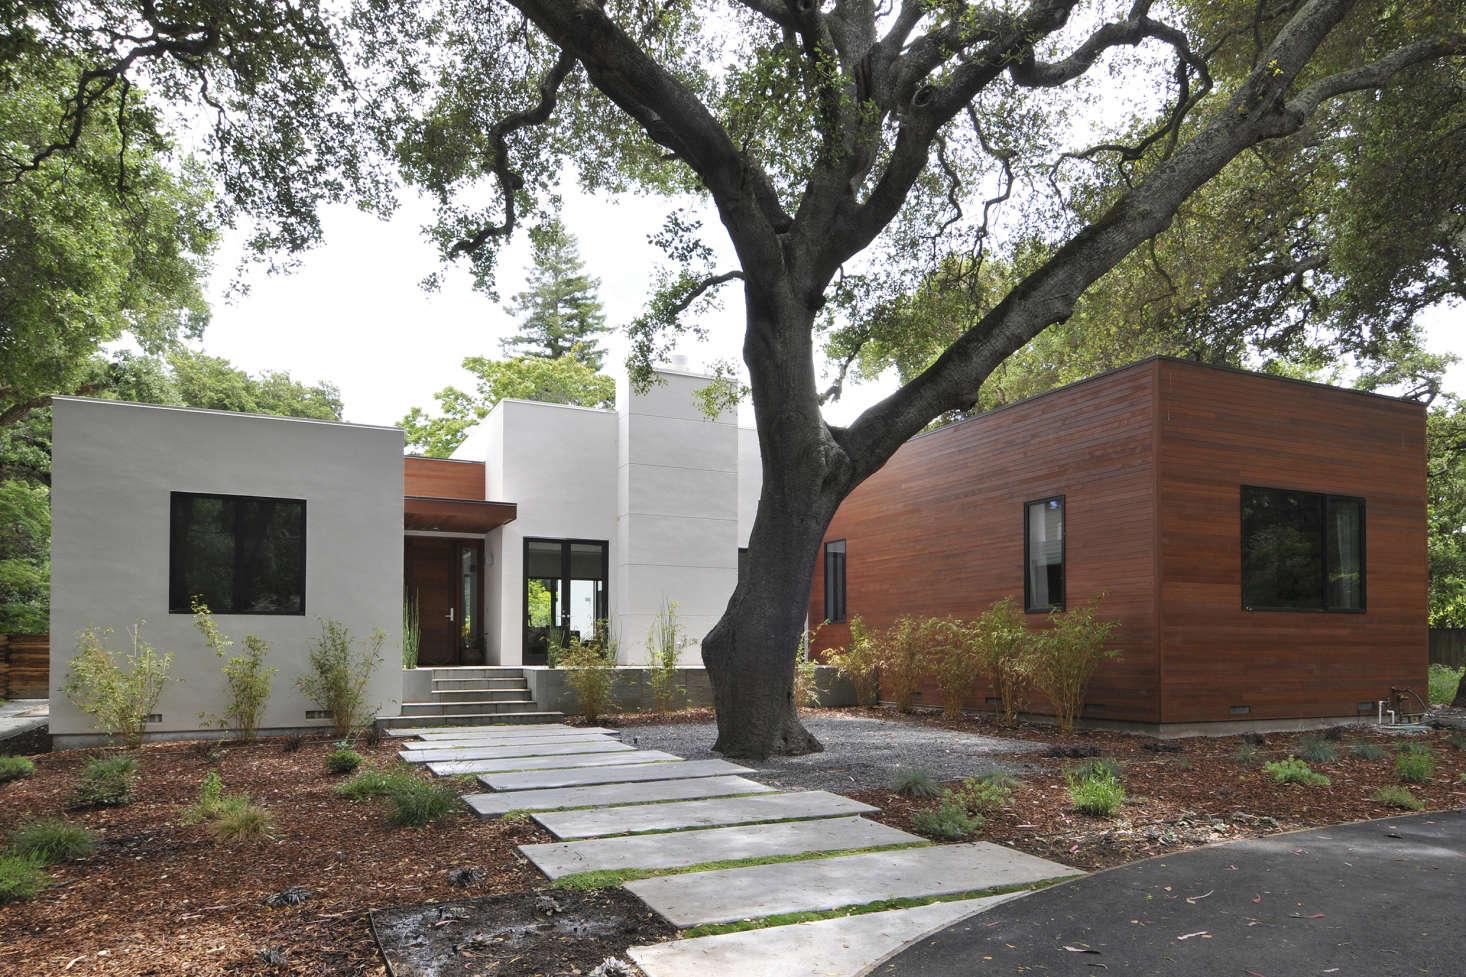 menlo oaks front exterior